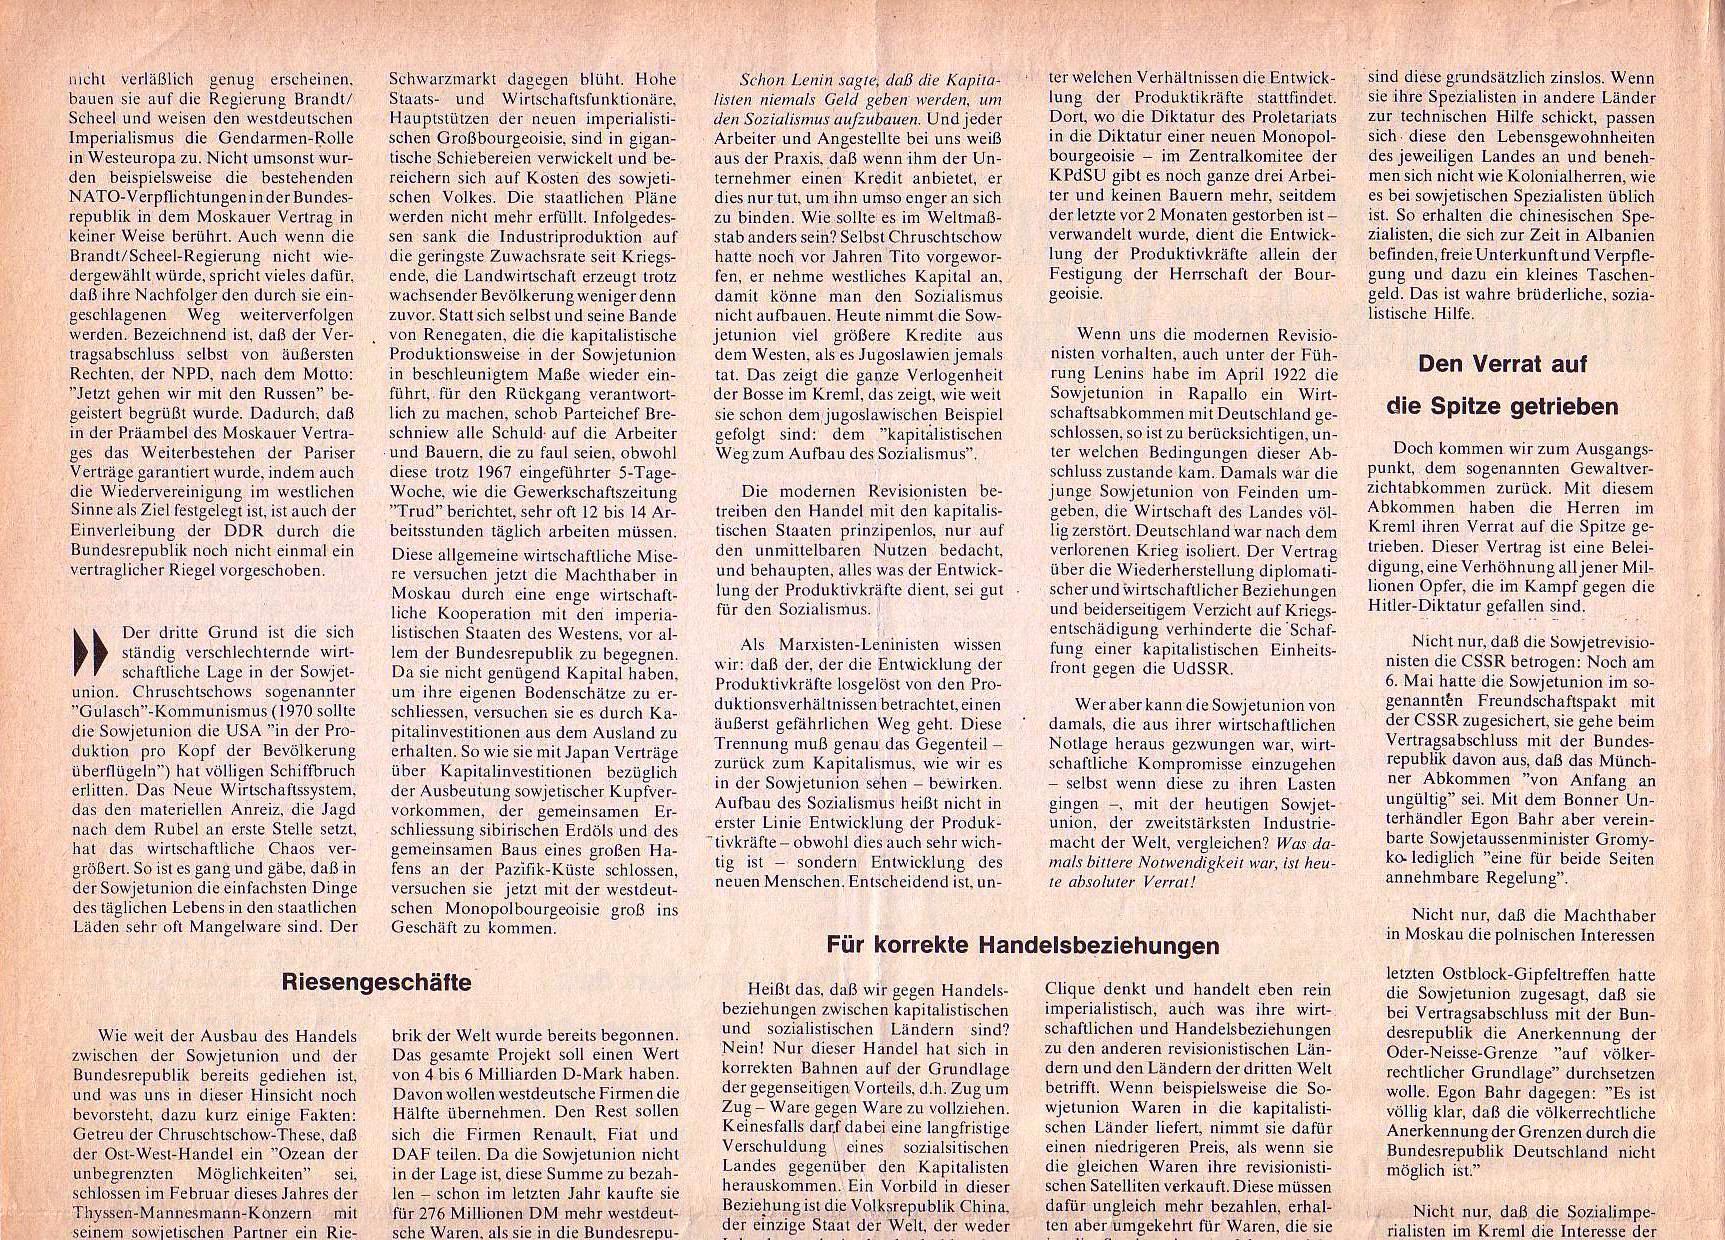 Roter Morgen, 4. Jg., September 1970, Nr. 8, Seite 4a